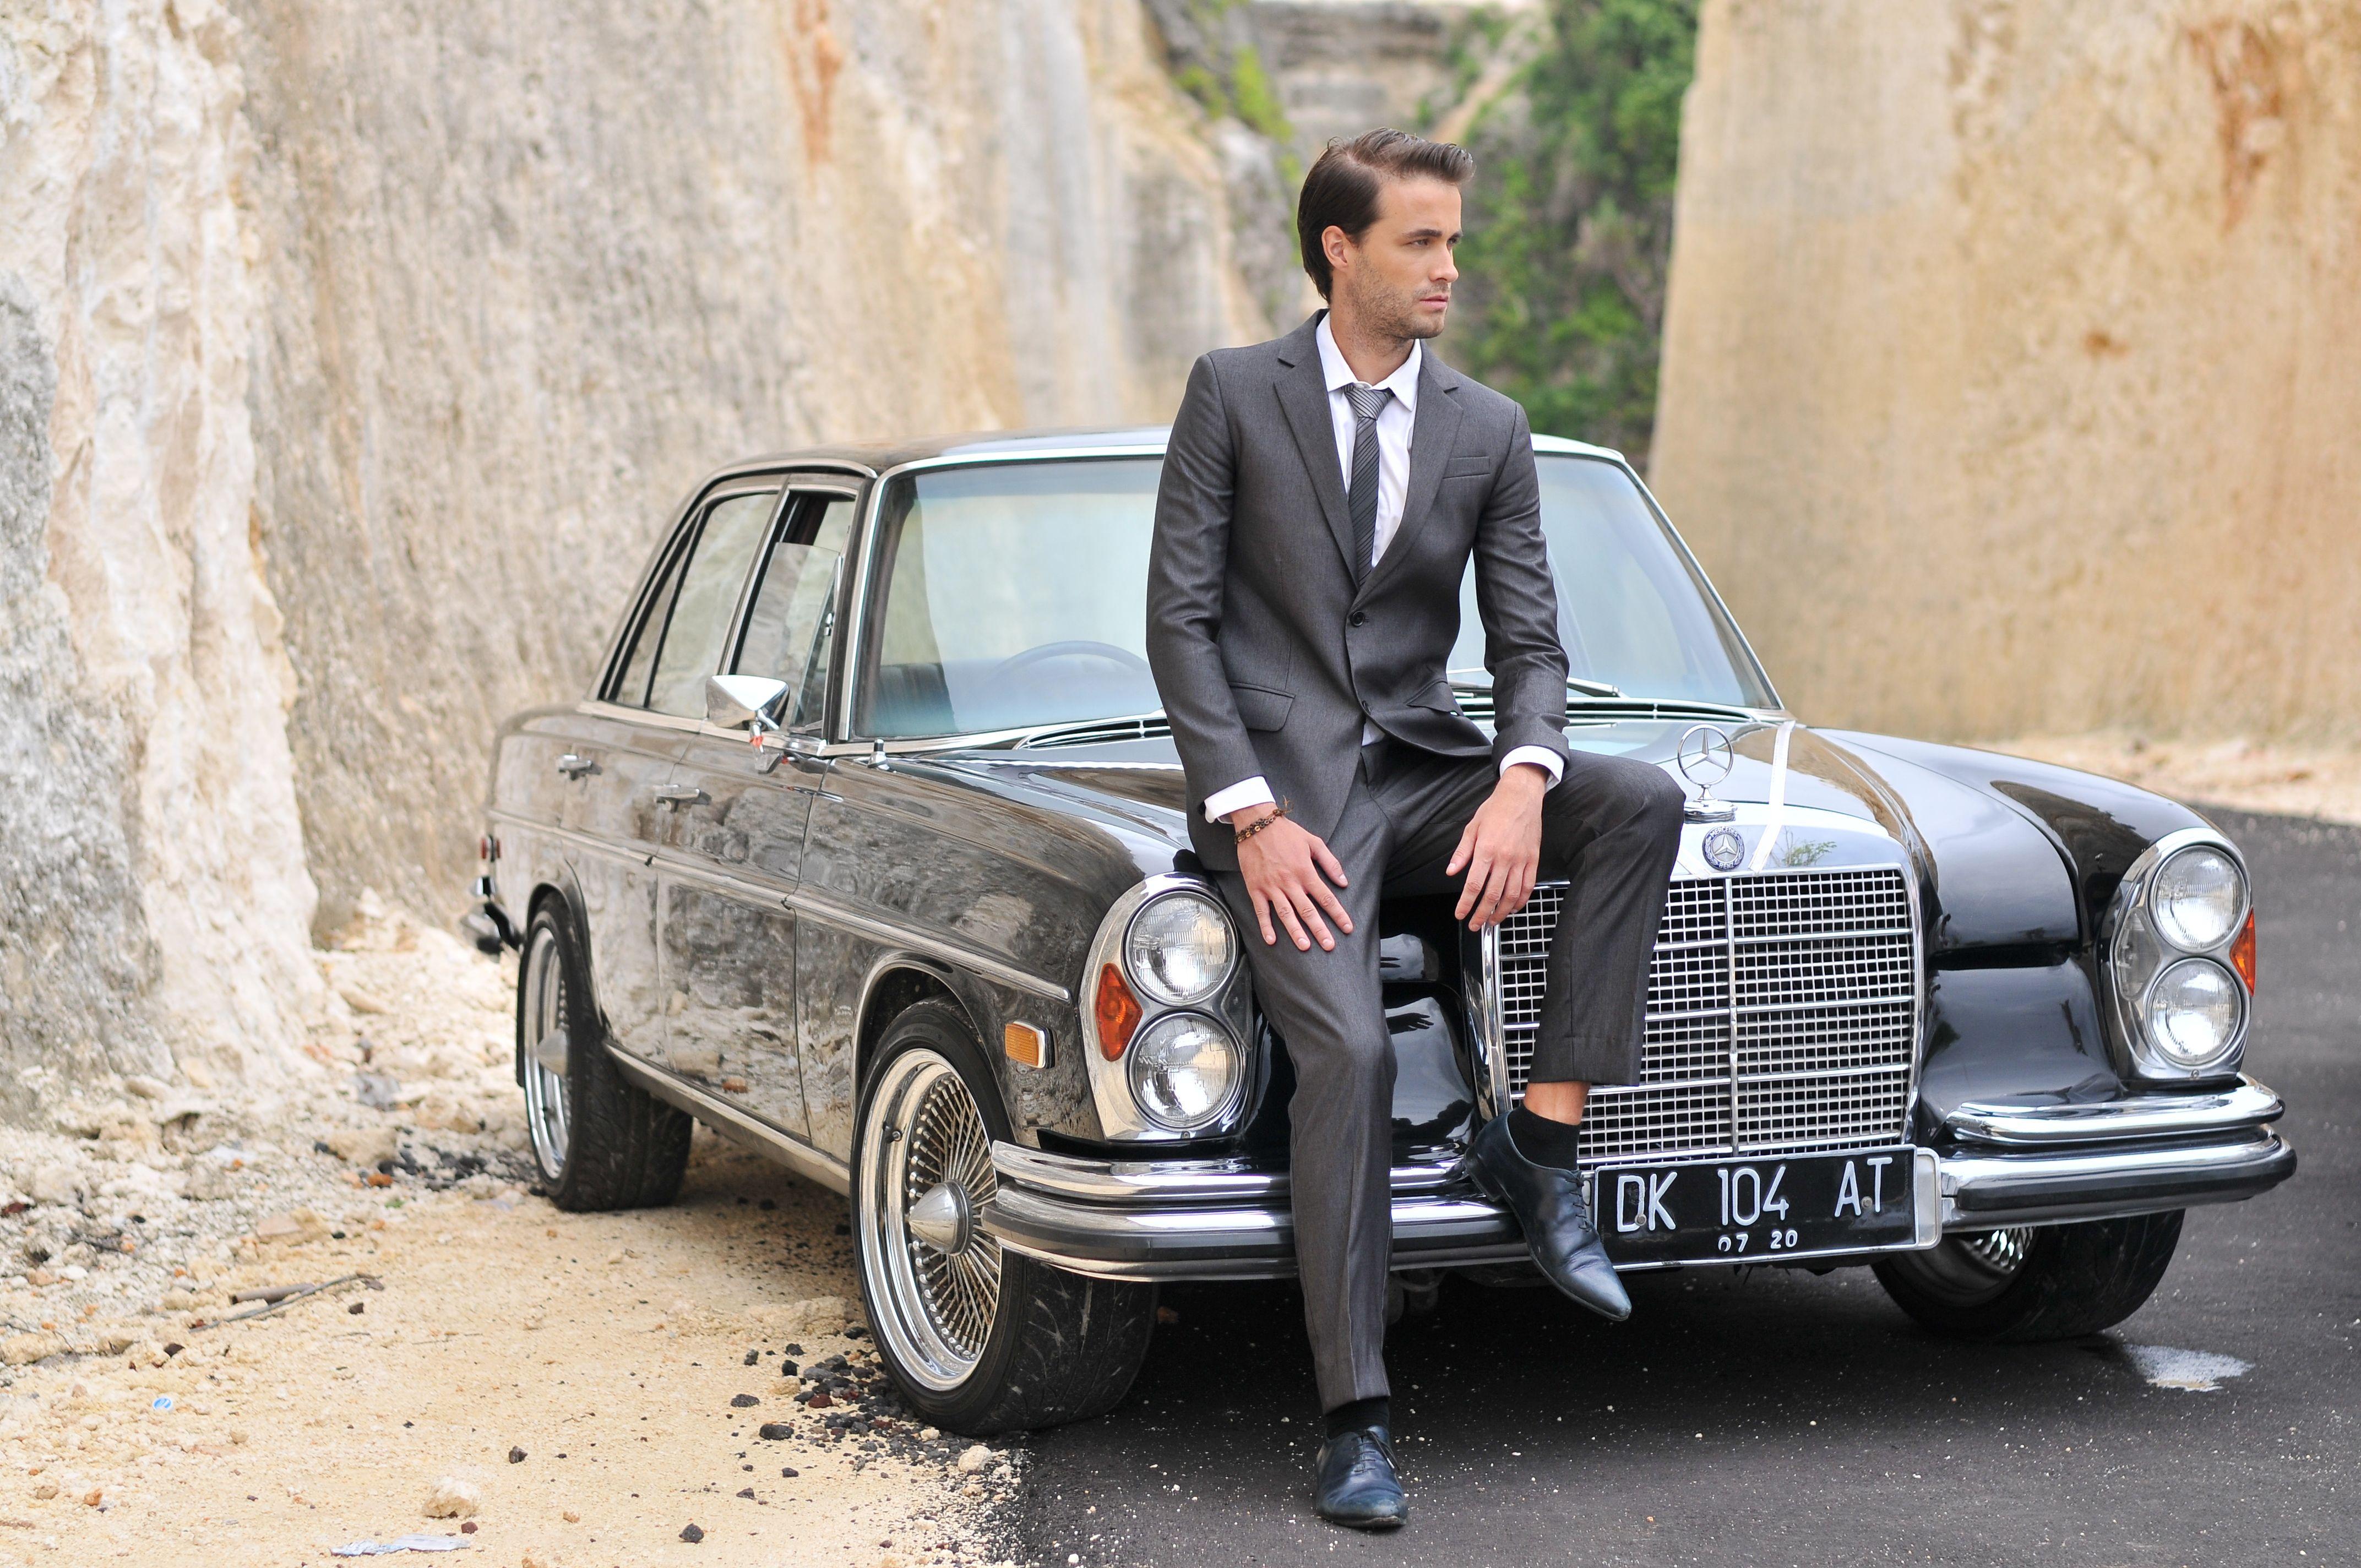 Classic car shoot in bali wedding car classic cars